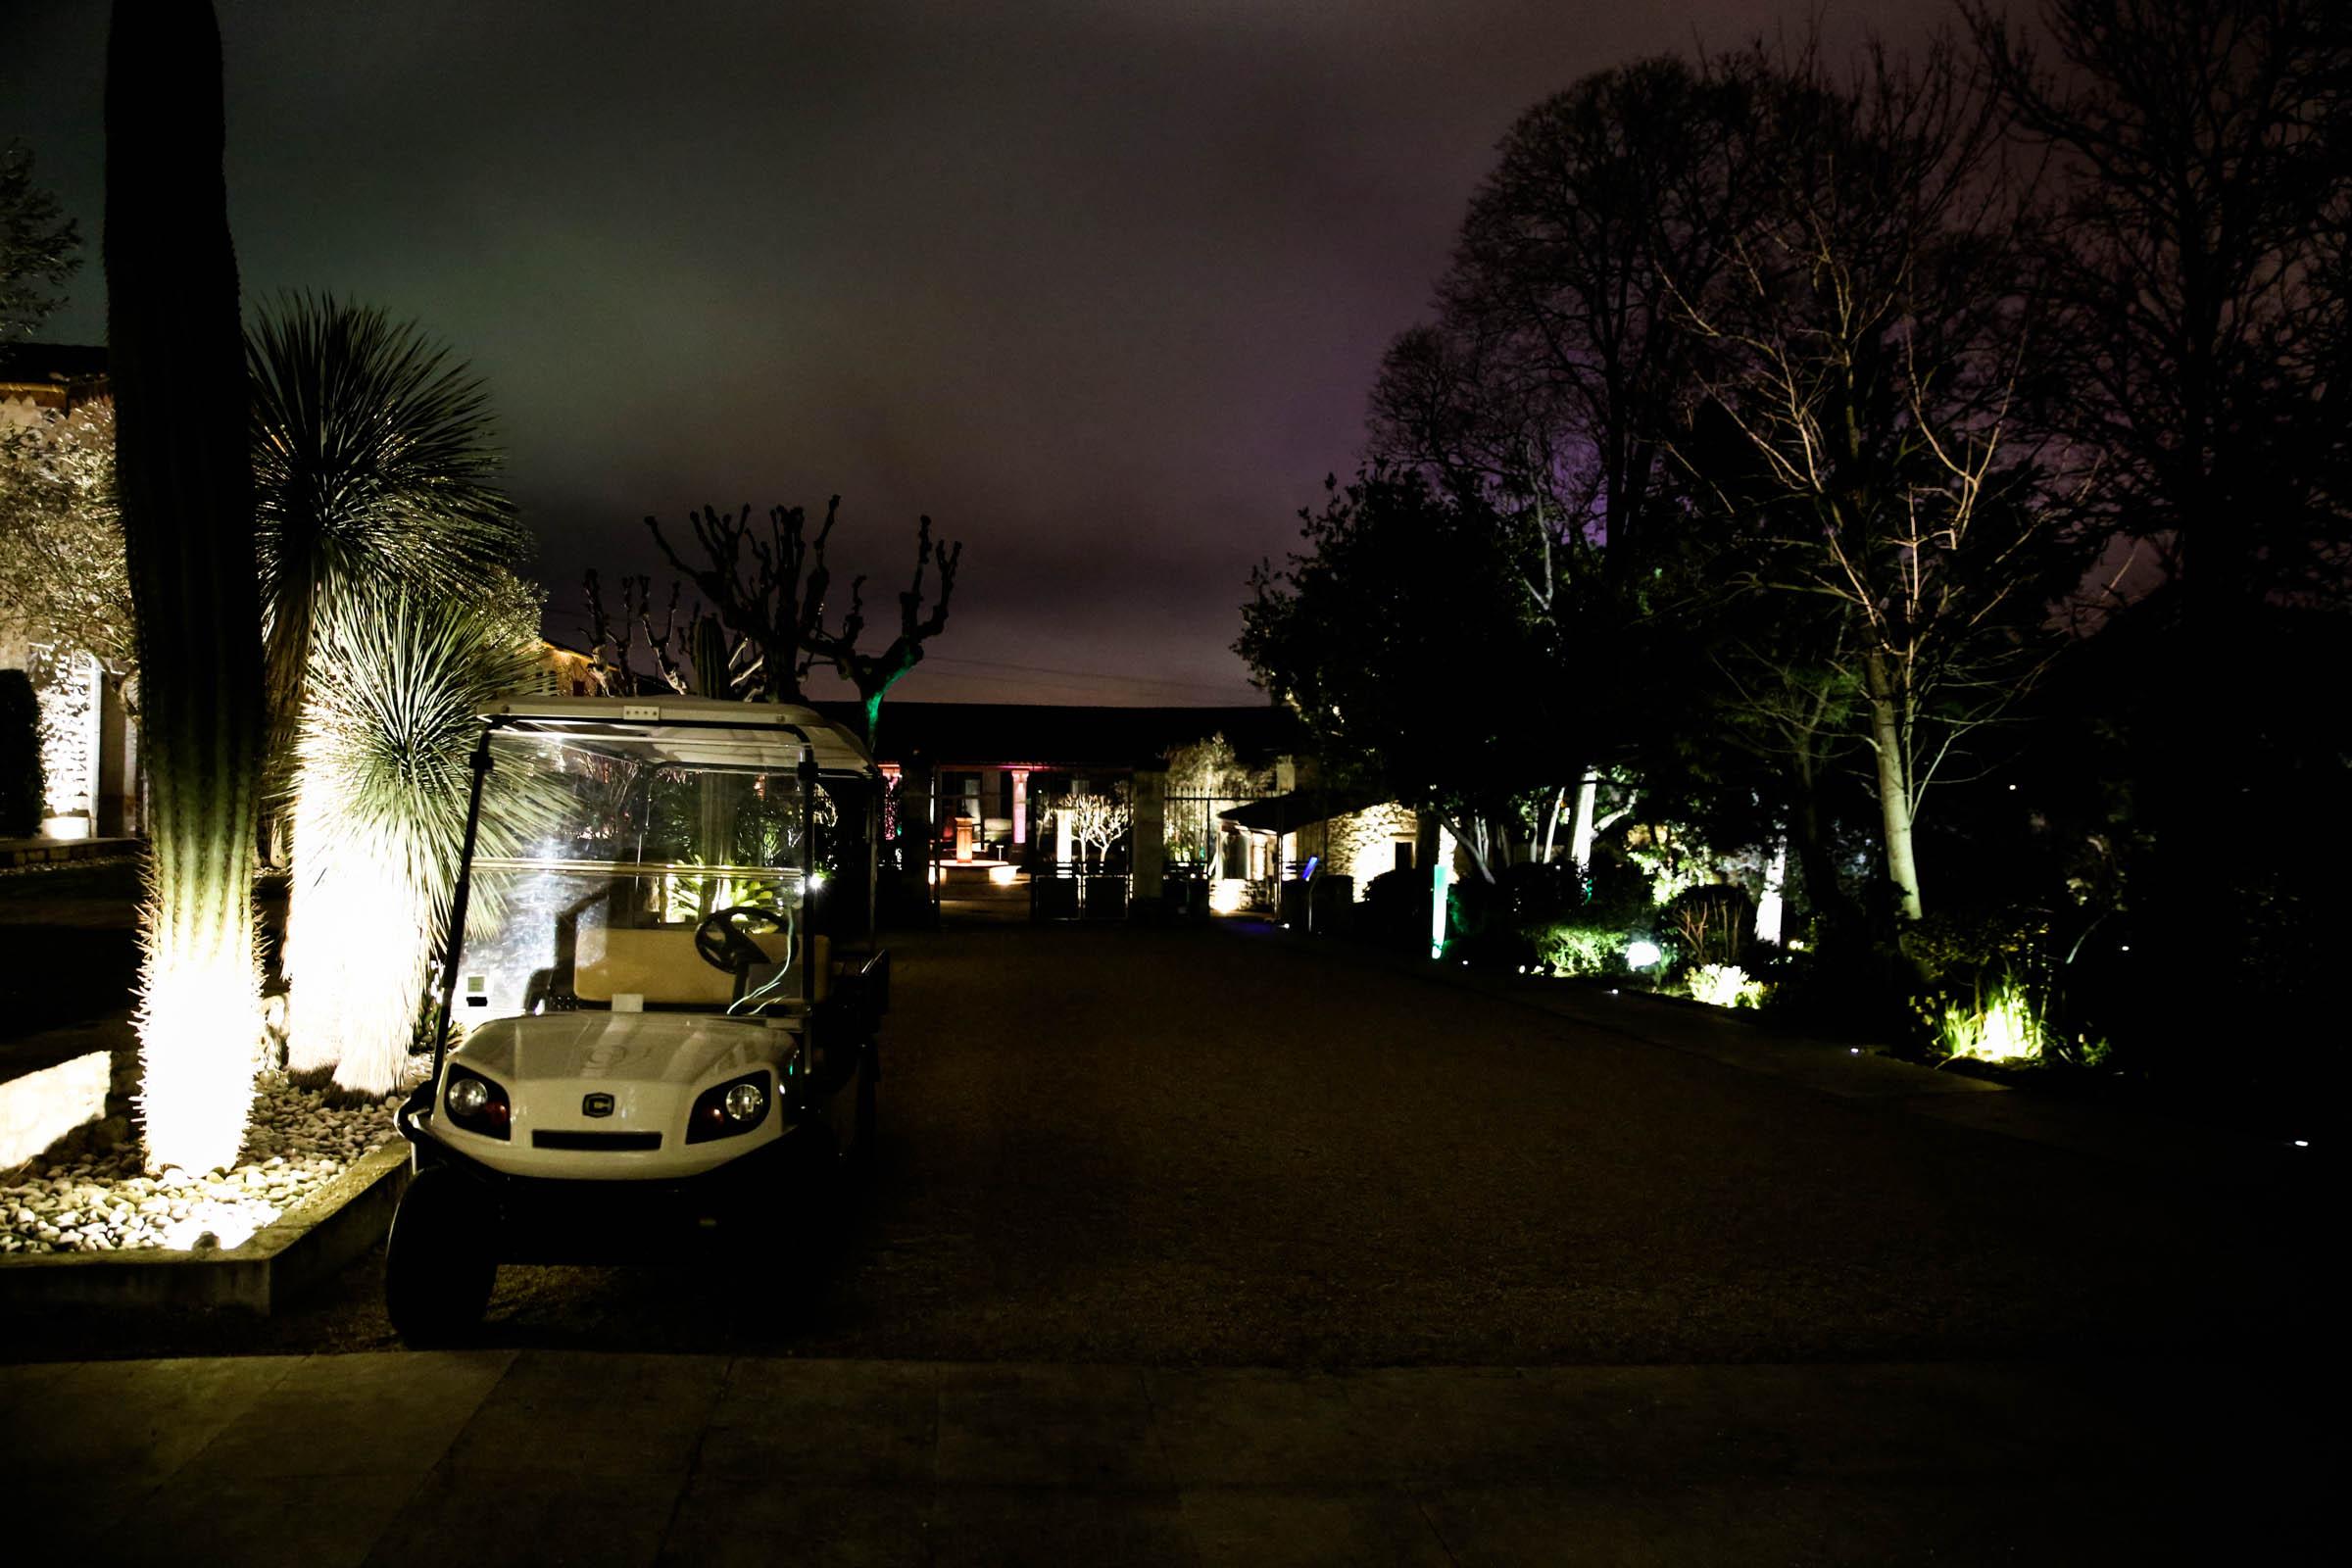 Domaine de Verchant Hotel by night